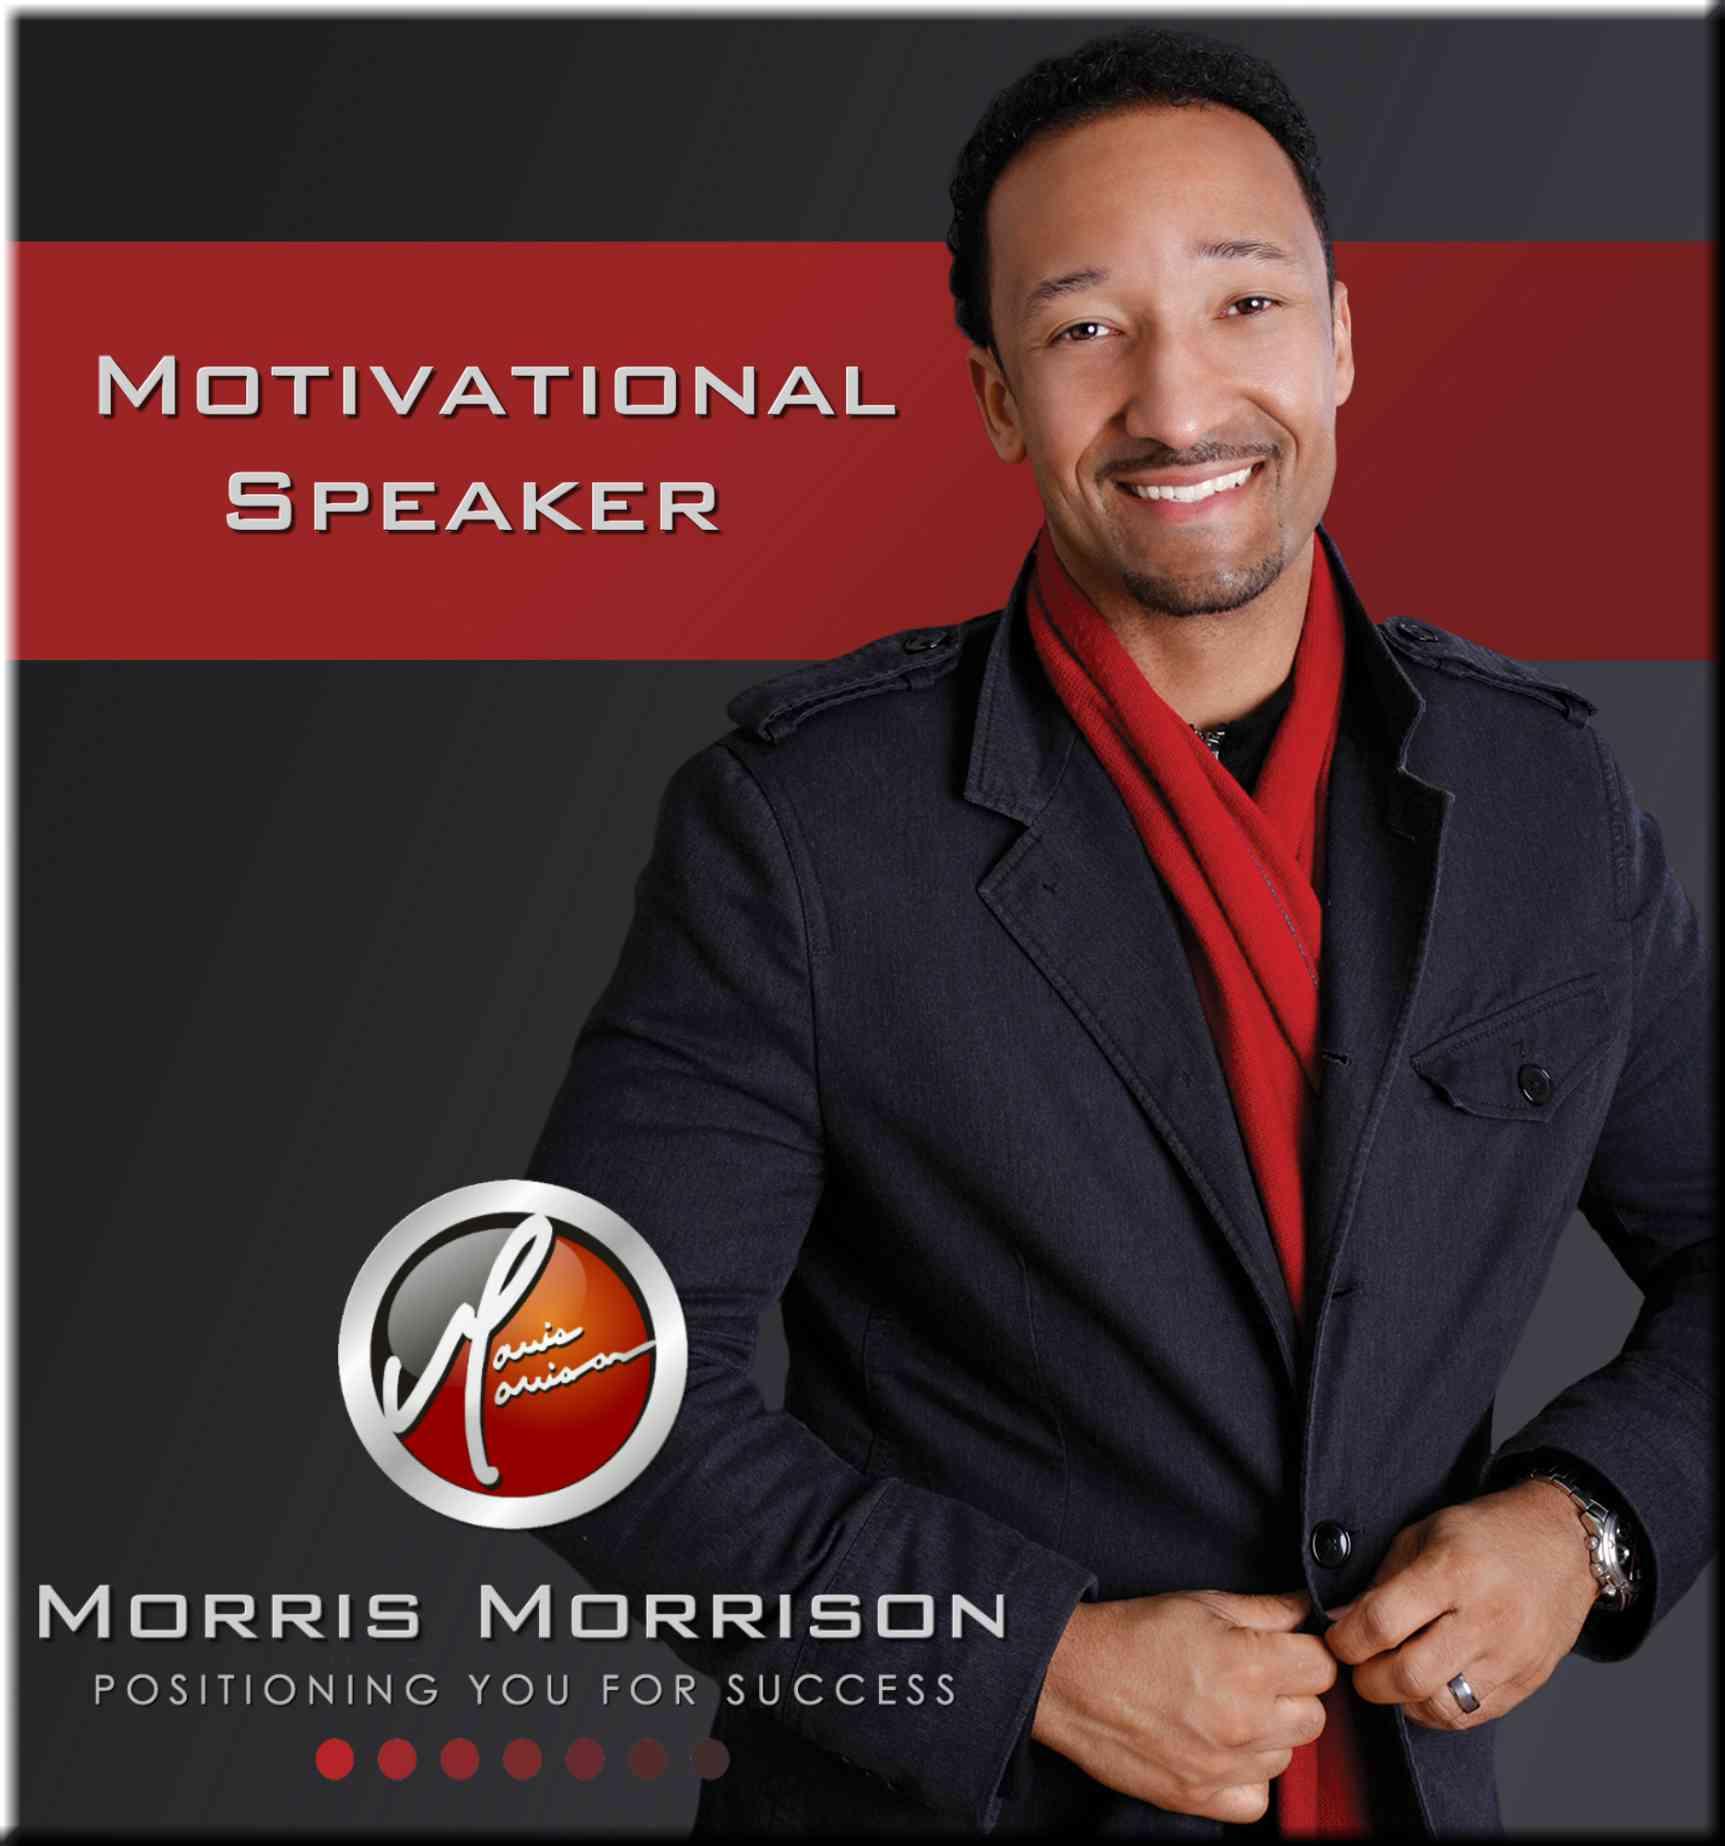 morris morrison motivational speaker interviewed by